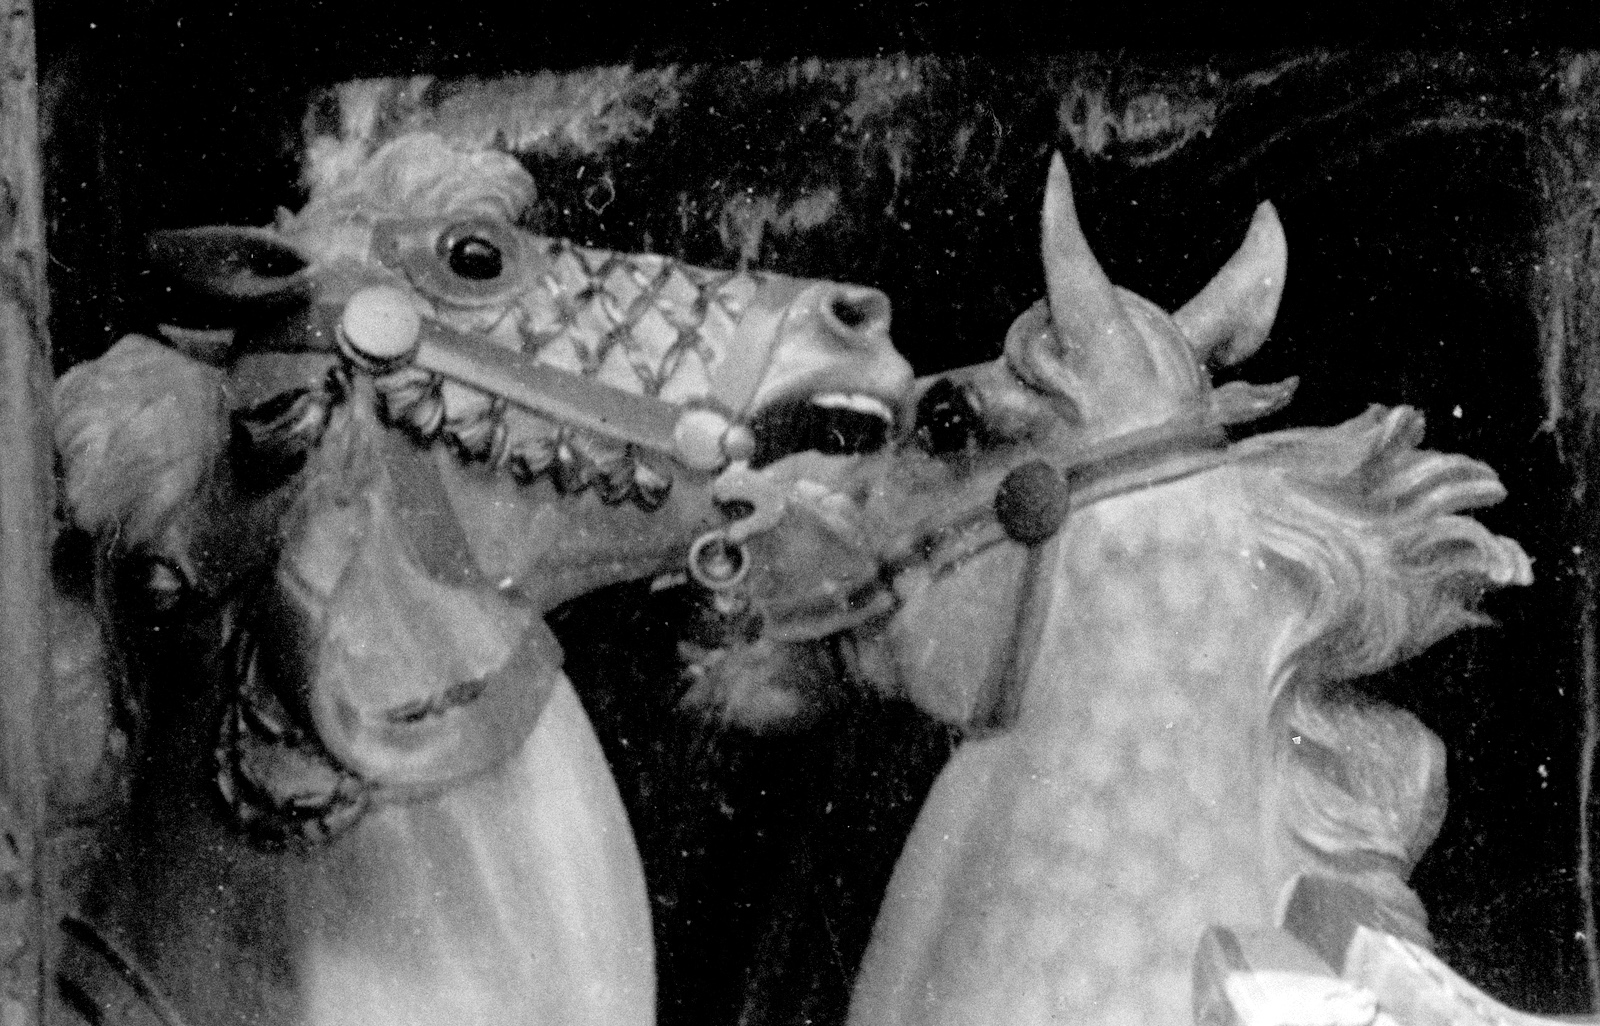 D-C-Muller-shop-carousel-horses-cu-center-1910